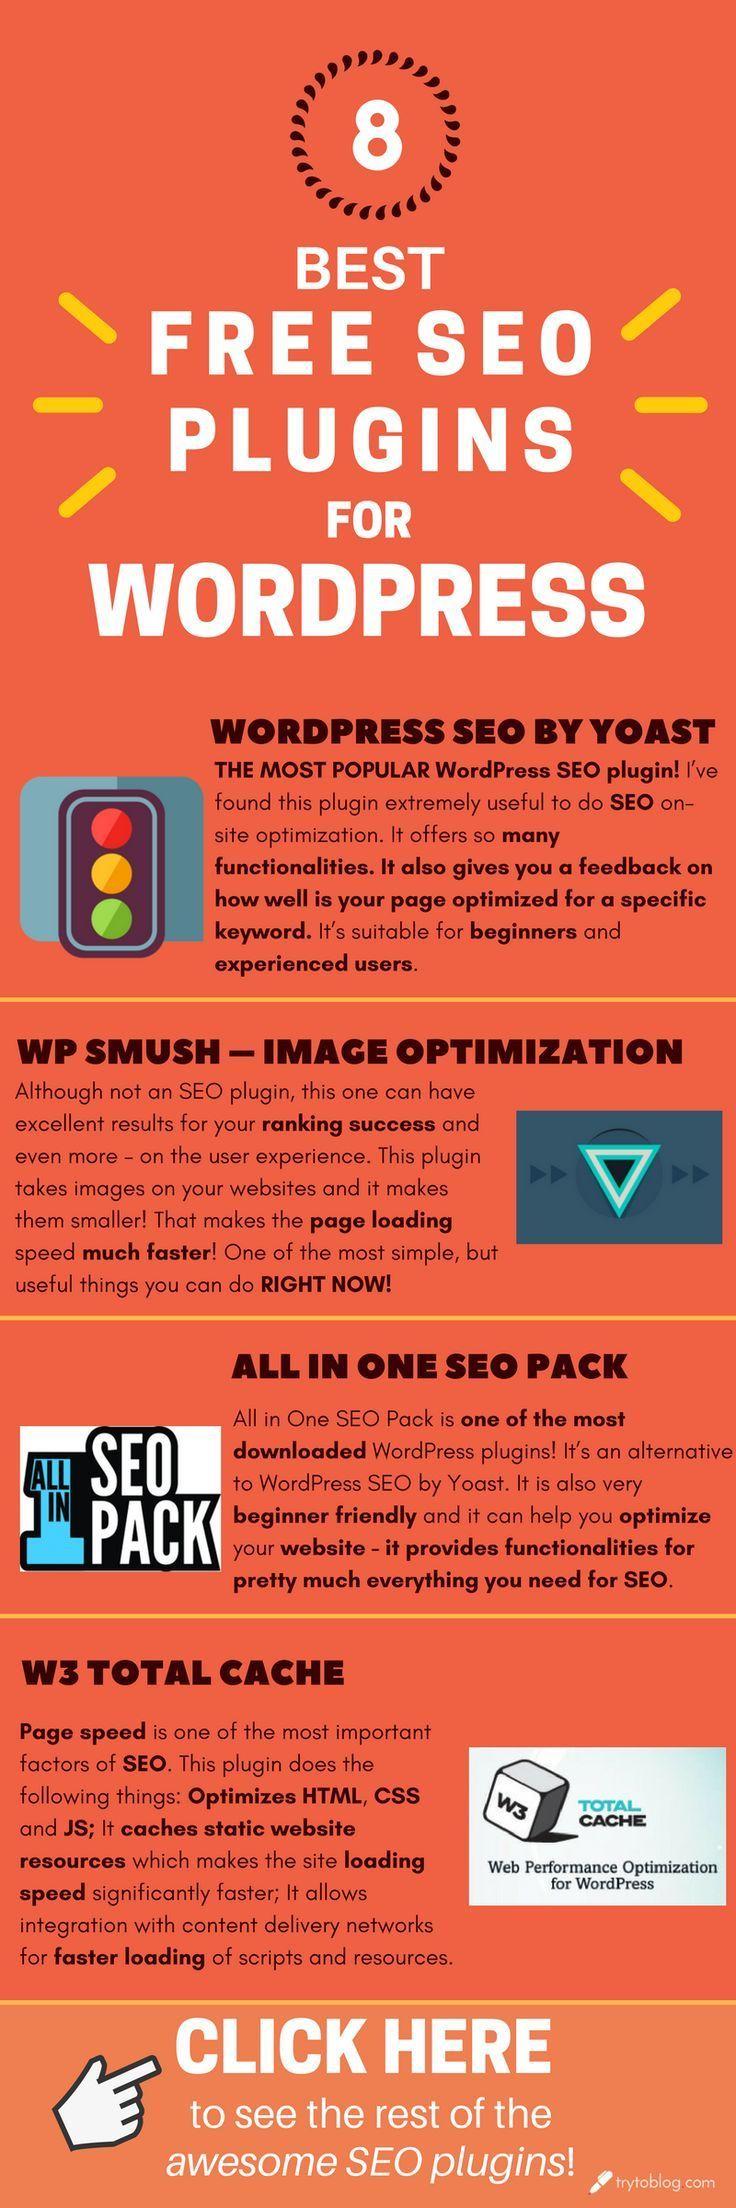 Know Your Audience When Marketing Online Wordpress Tricks Seo